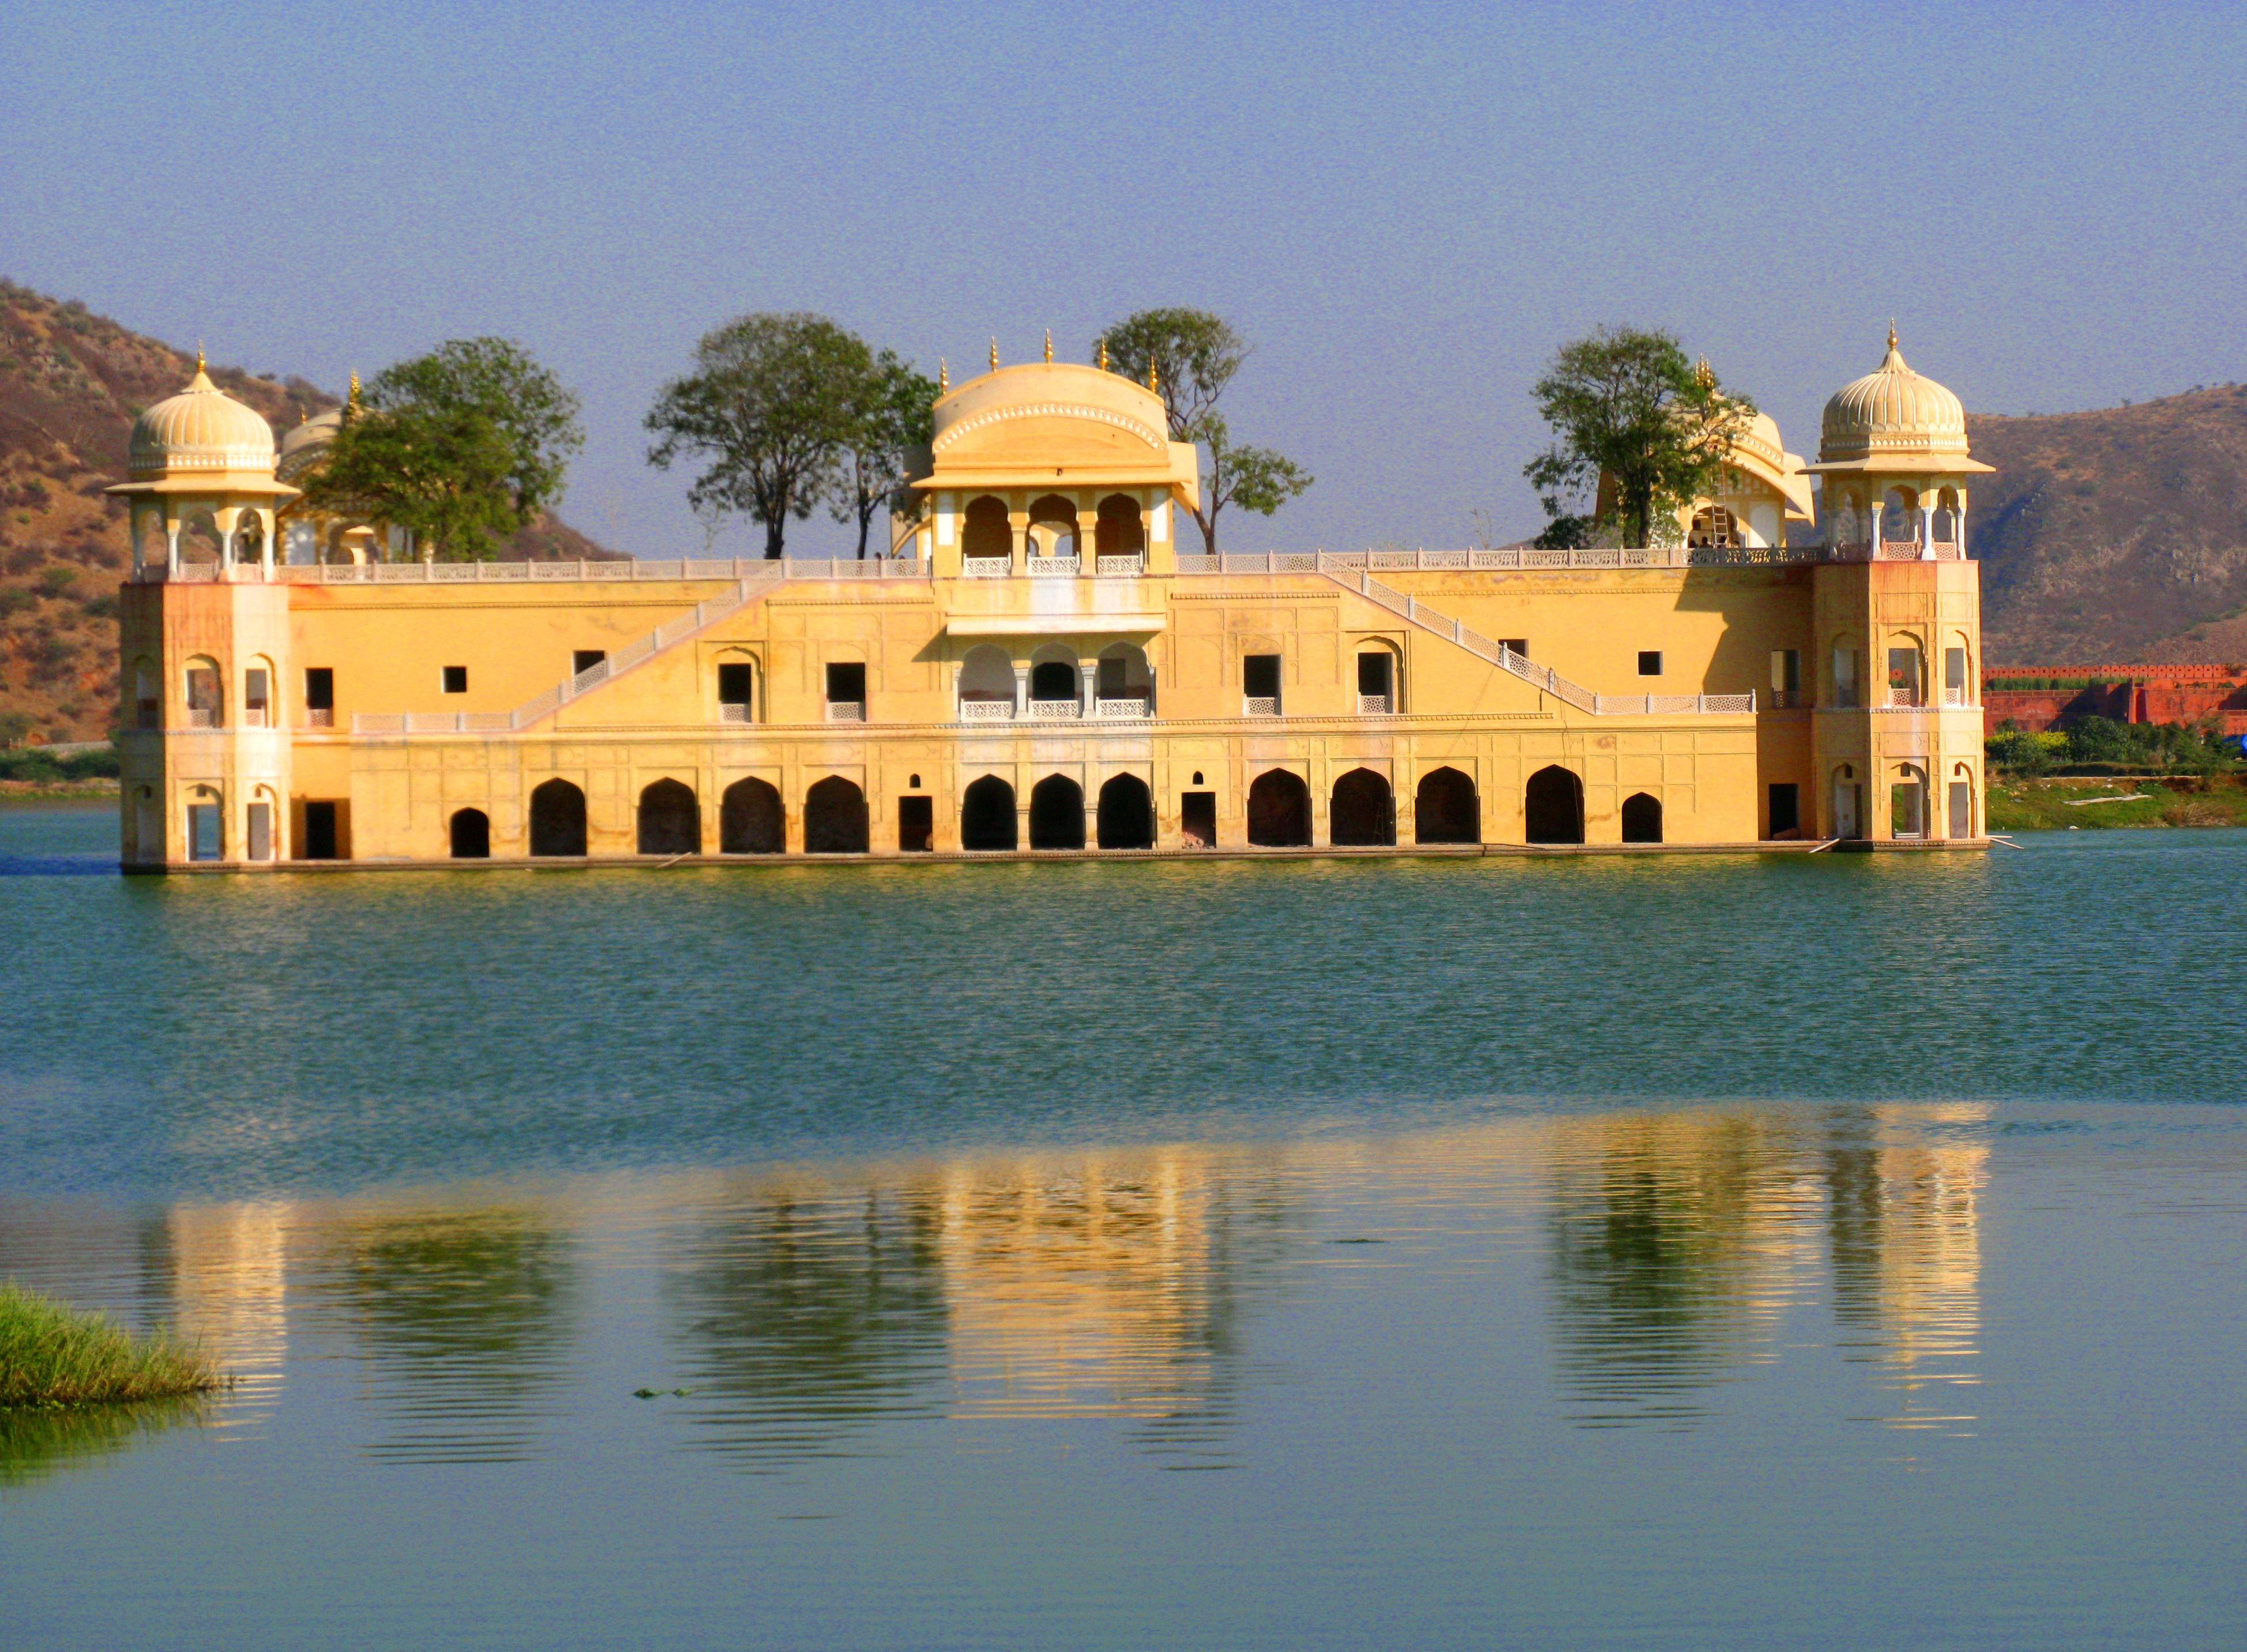 100 Free Online Dating in Jaipur City RJ